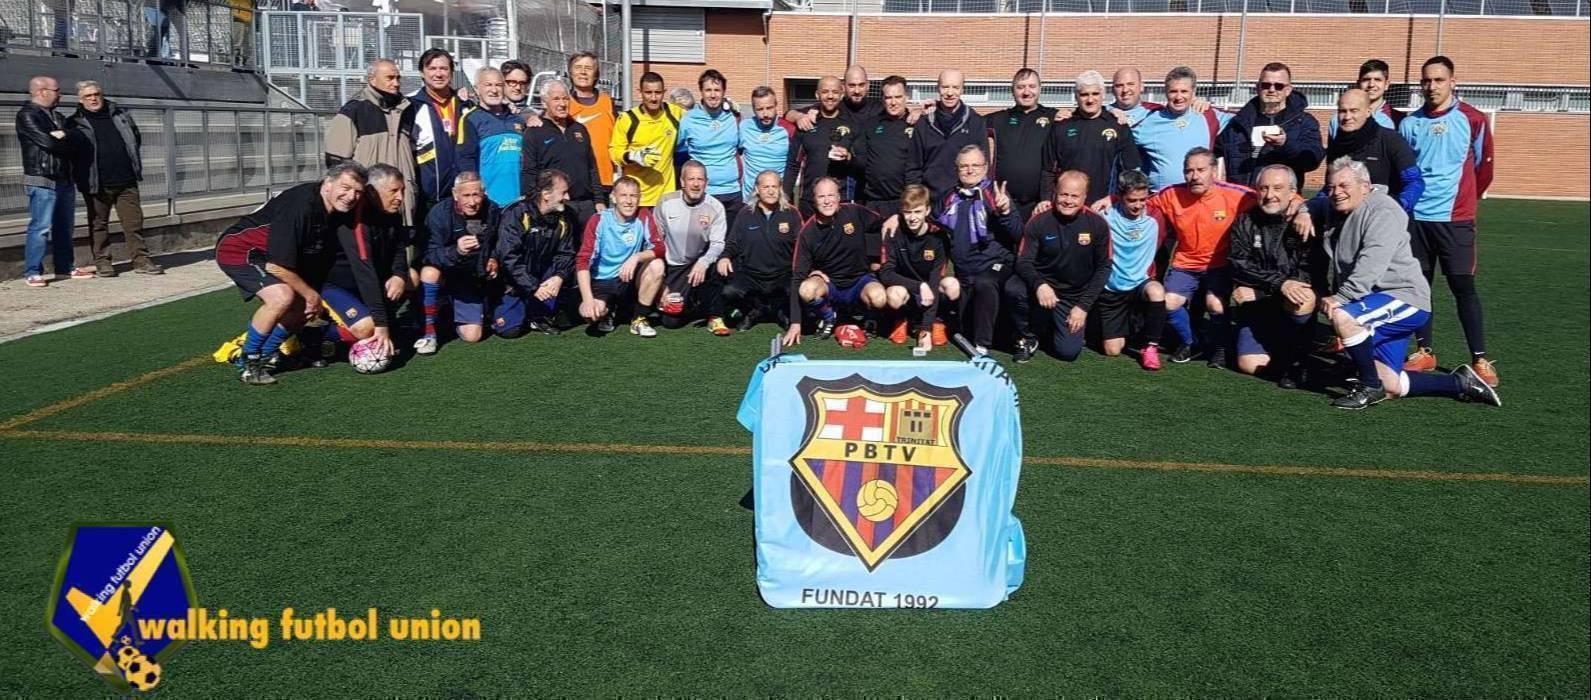 La PB Trinitat Vella celebra 25 anys disputant el Torneig Walking Football Union